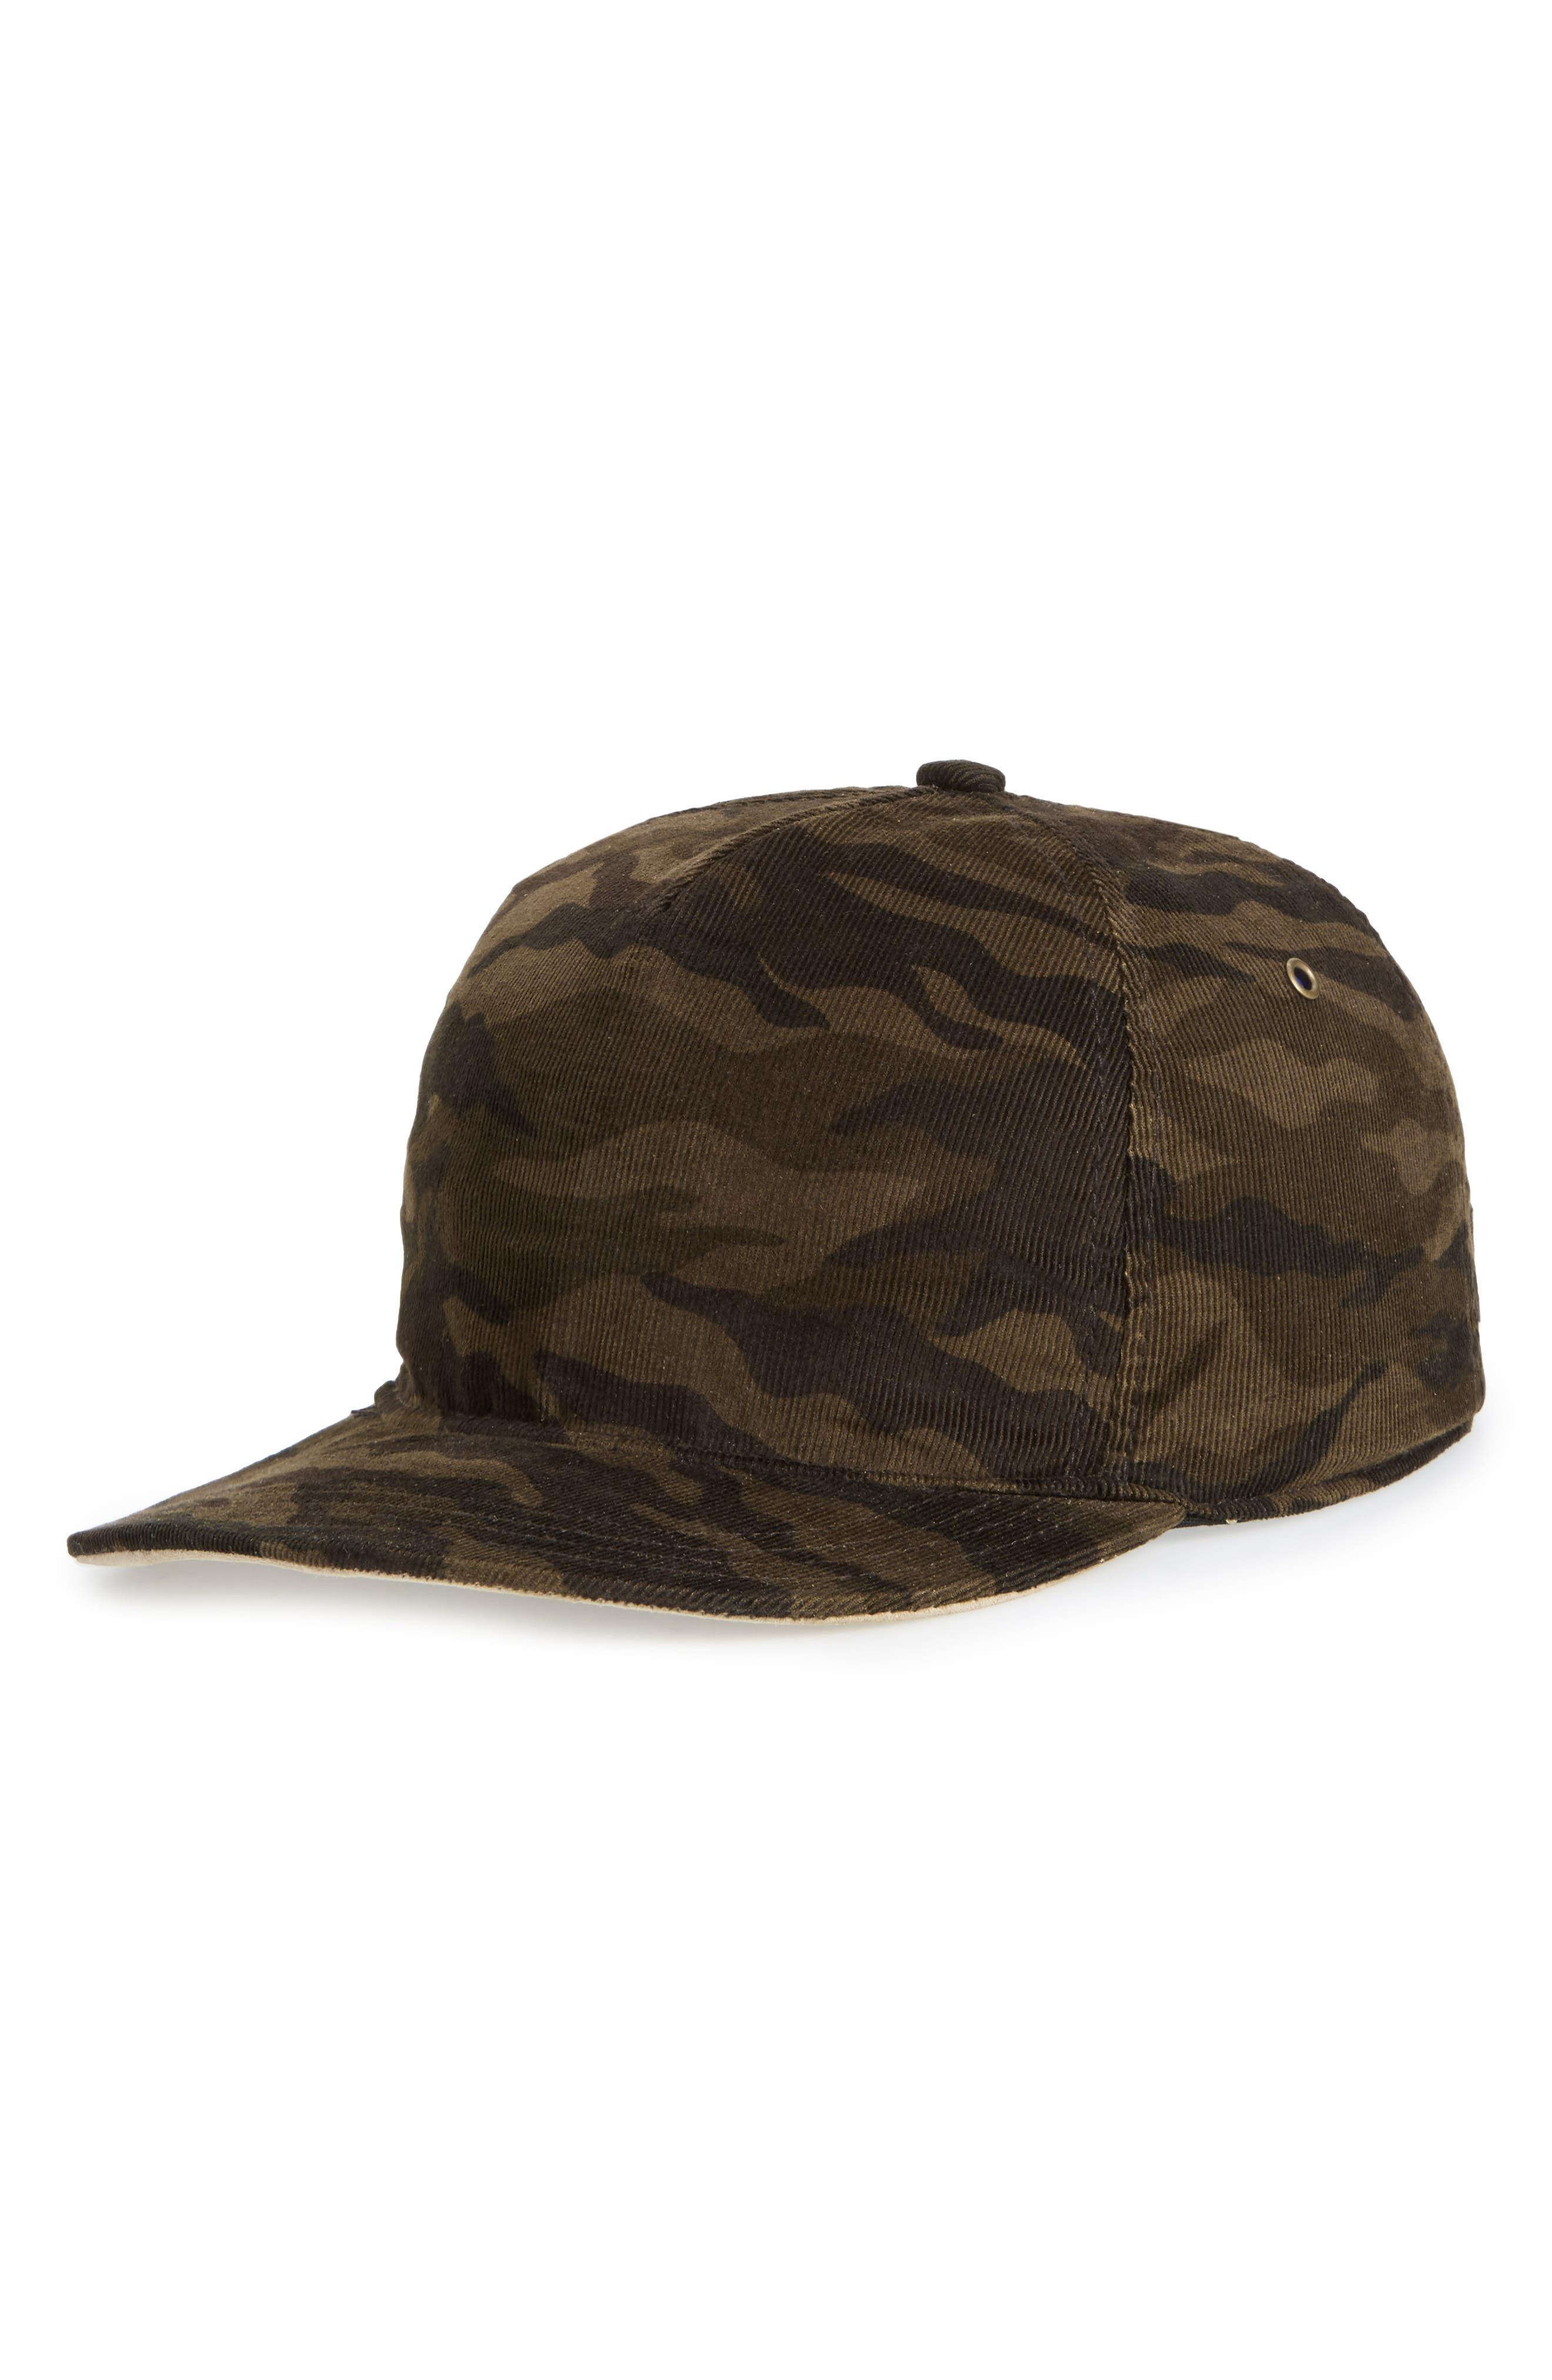 The Hunt Camo Corduroy Ball Cap,                         Main,                         color, Camo